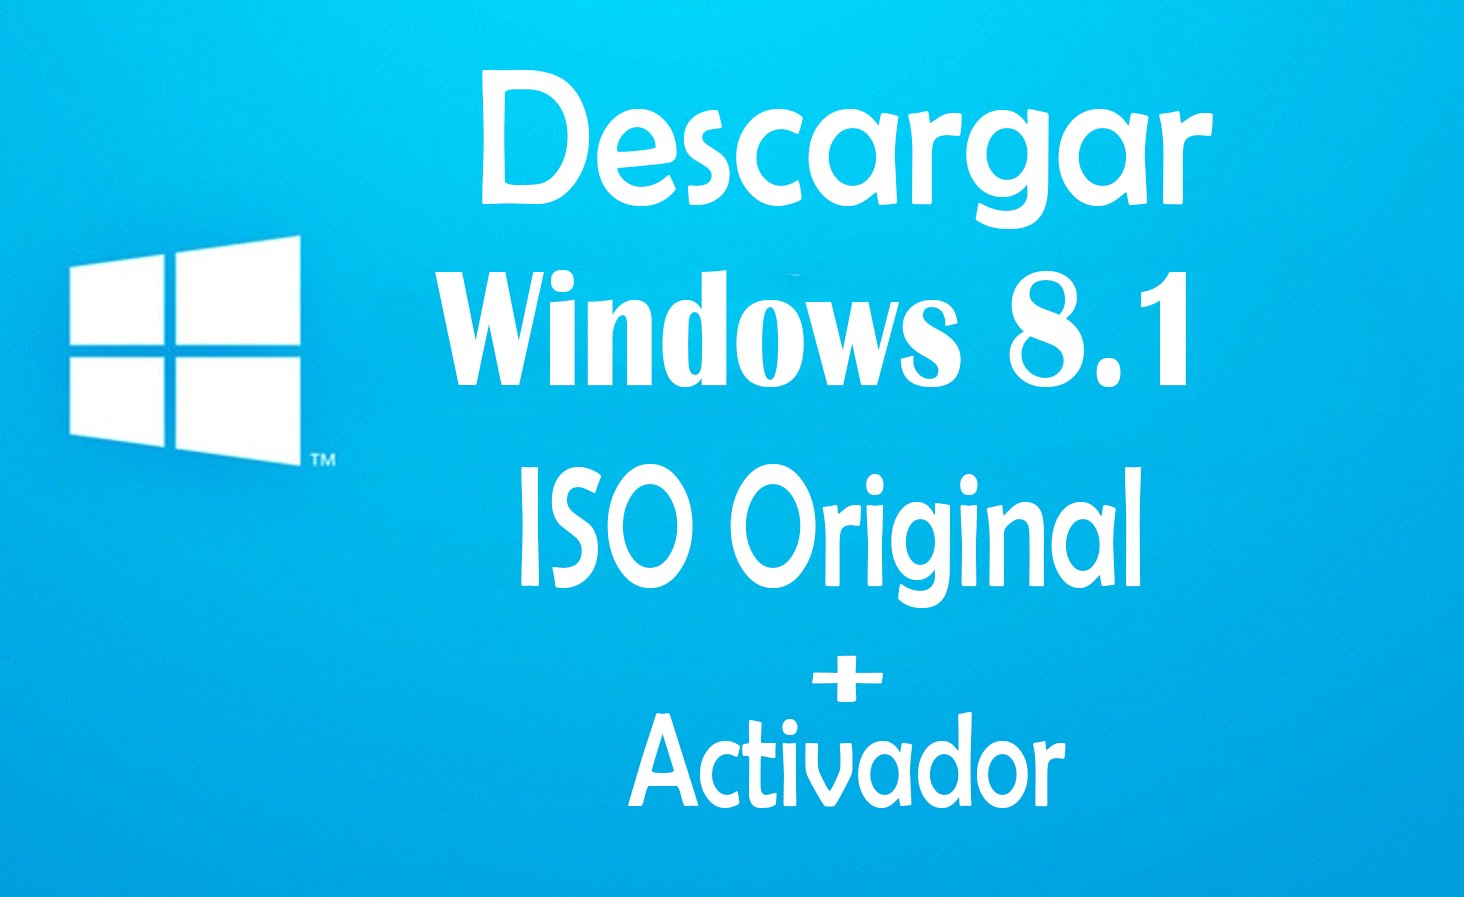 windows 8.1 pro 64 bits español iso utorrent